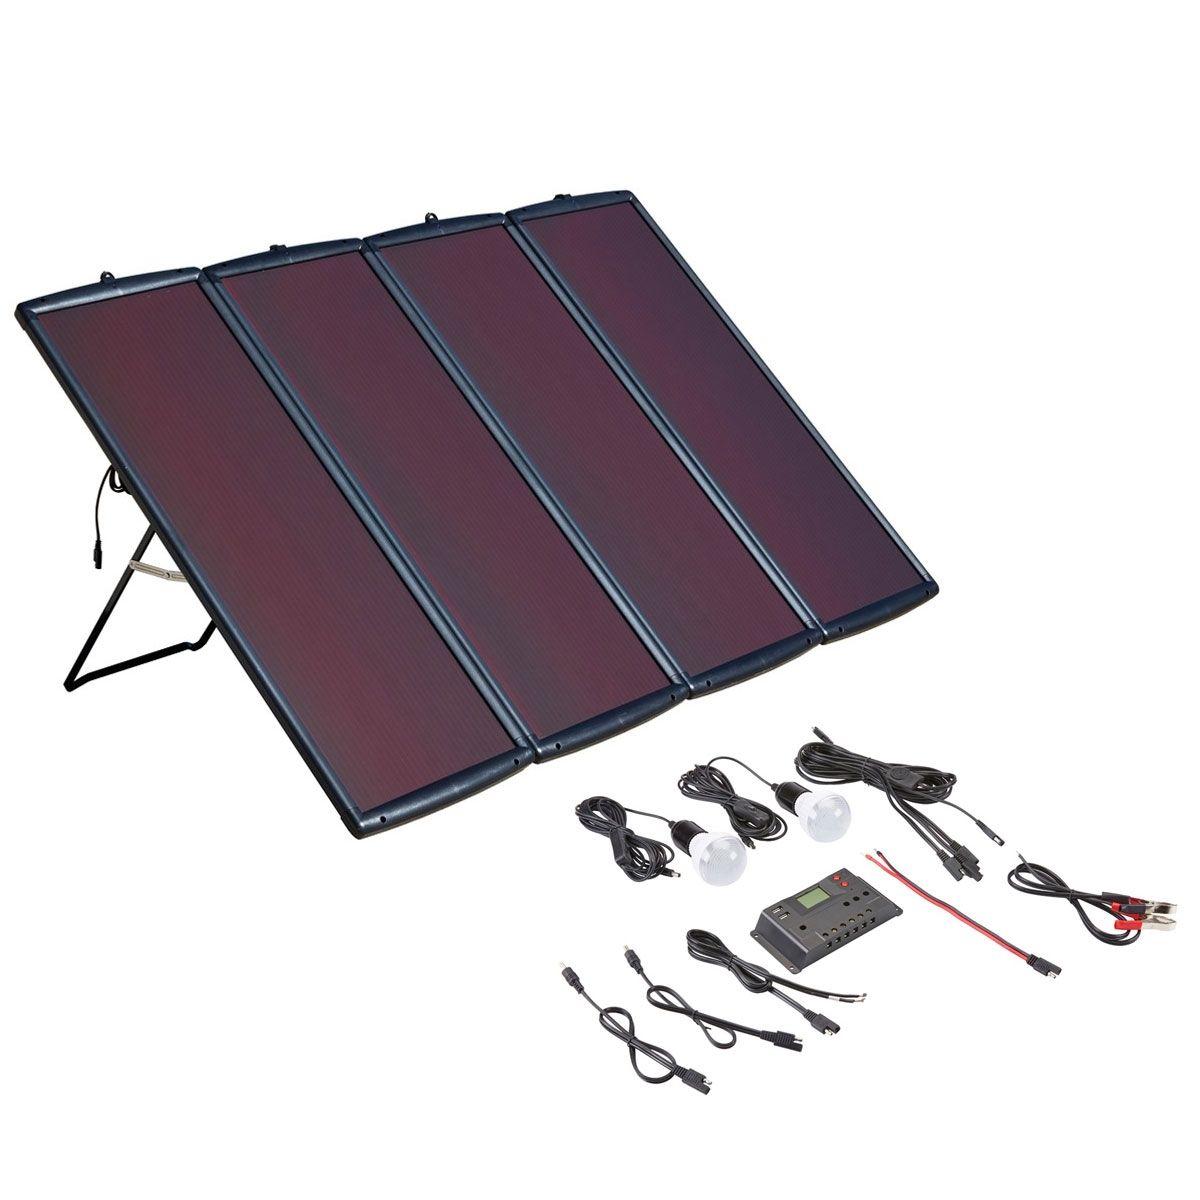 100 Watt Solar Panel Kit Solar Panel Kits 100 Watt Solar Panel Solar Energy Panels